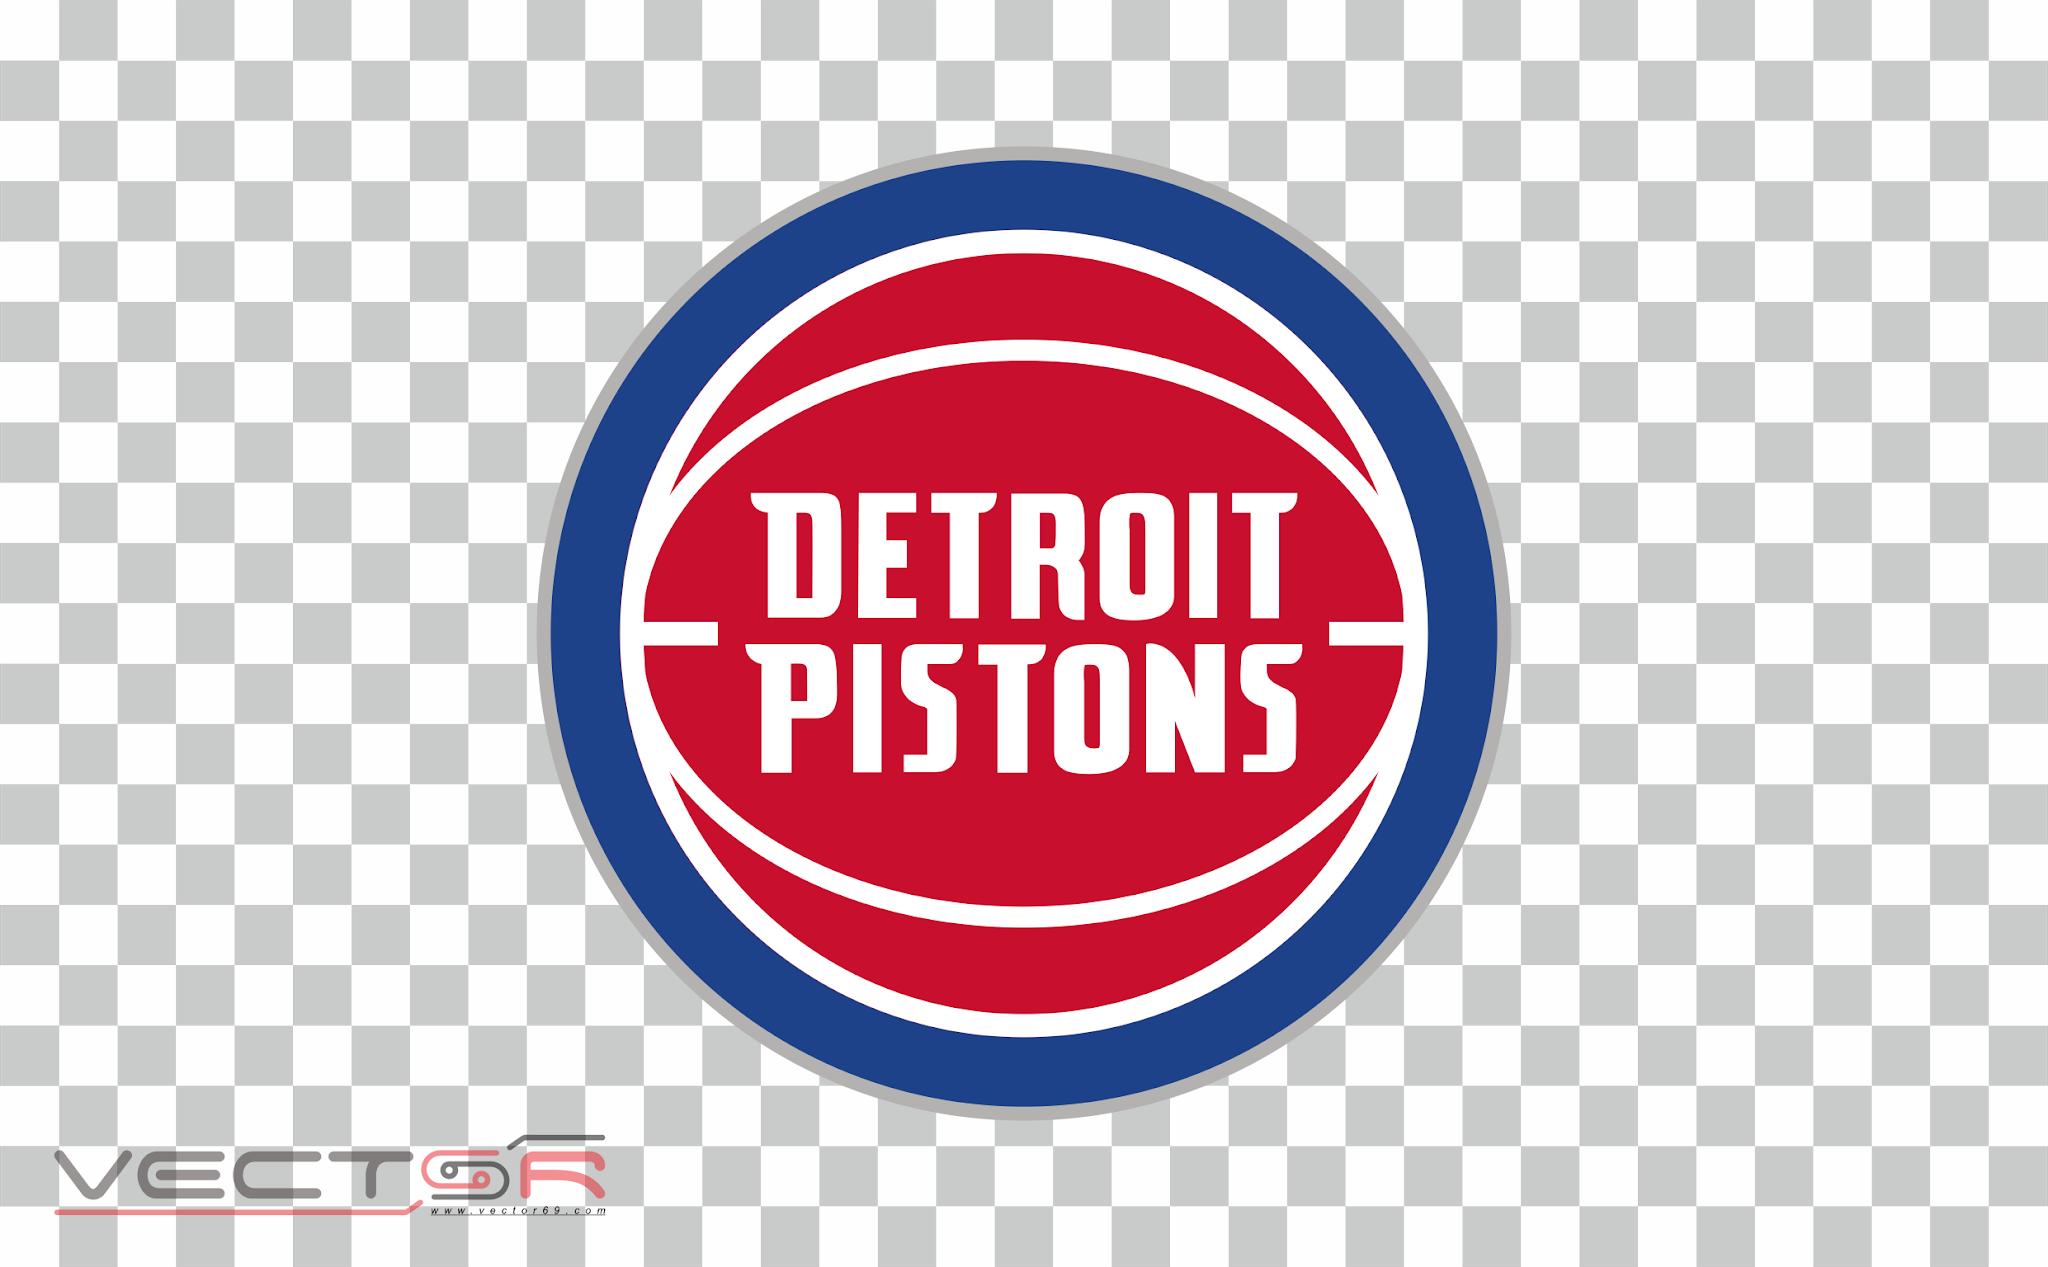 Detroit Pistons Logo - Download .PNG (Portable Network Graphics) Transparent Images